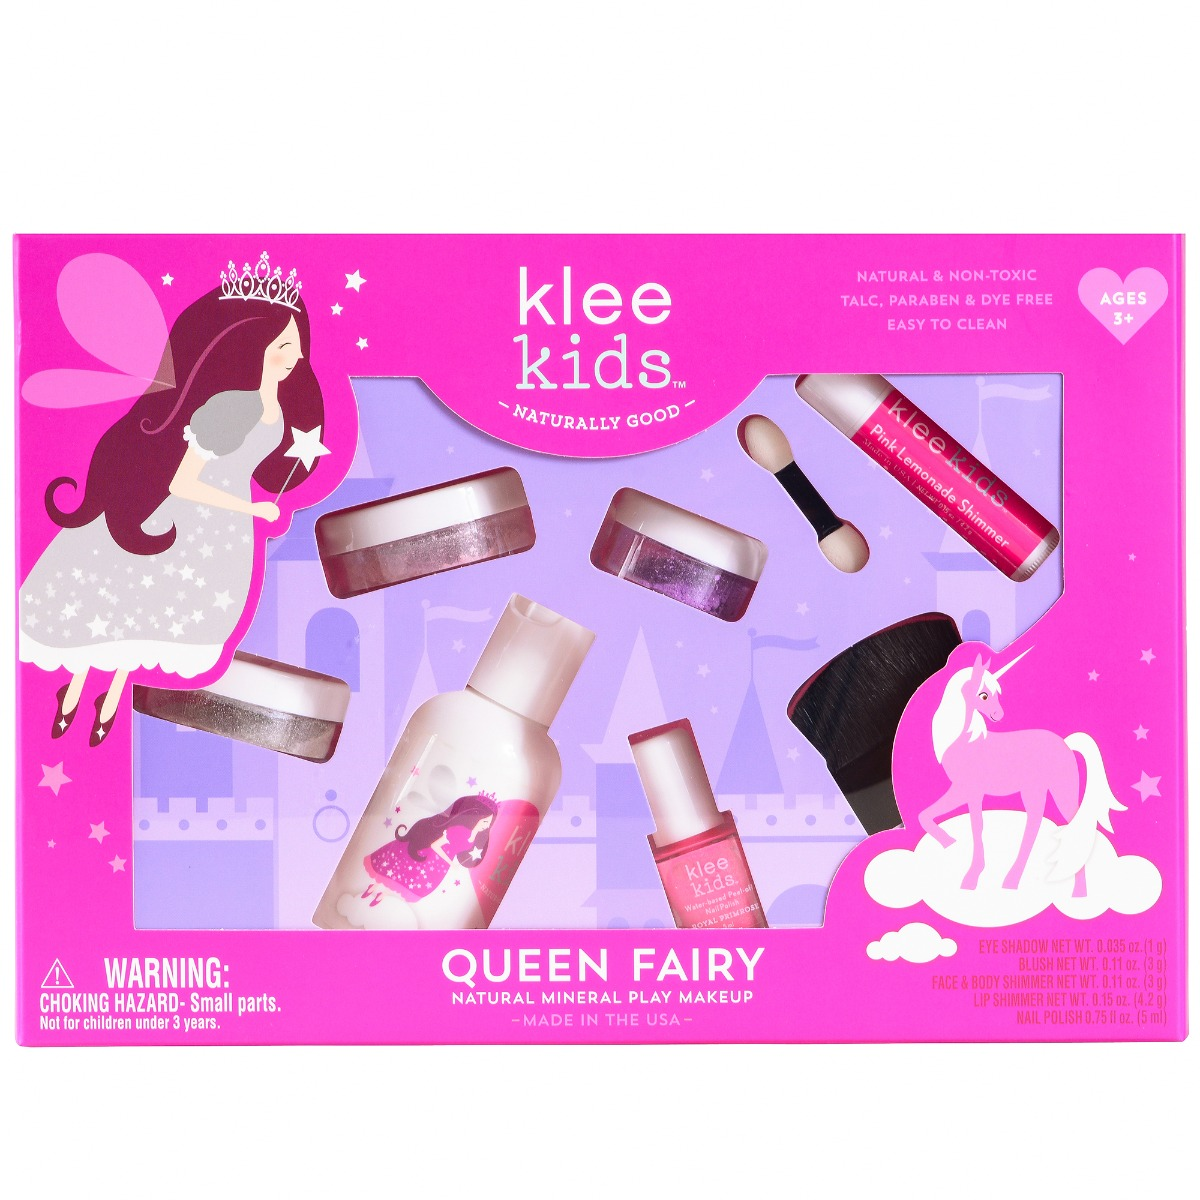 Natural Play Makeup Set - Queen Fairy